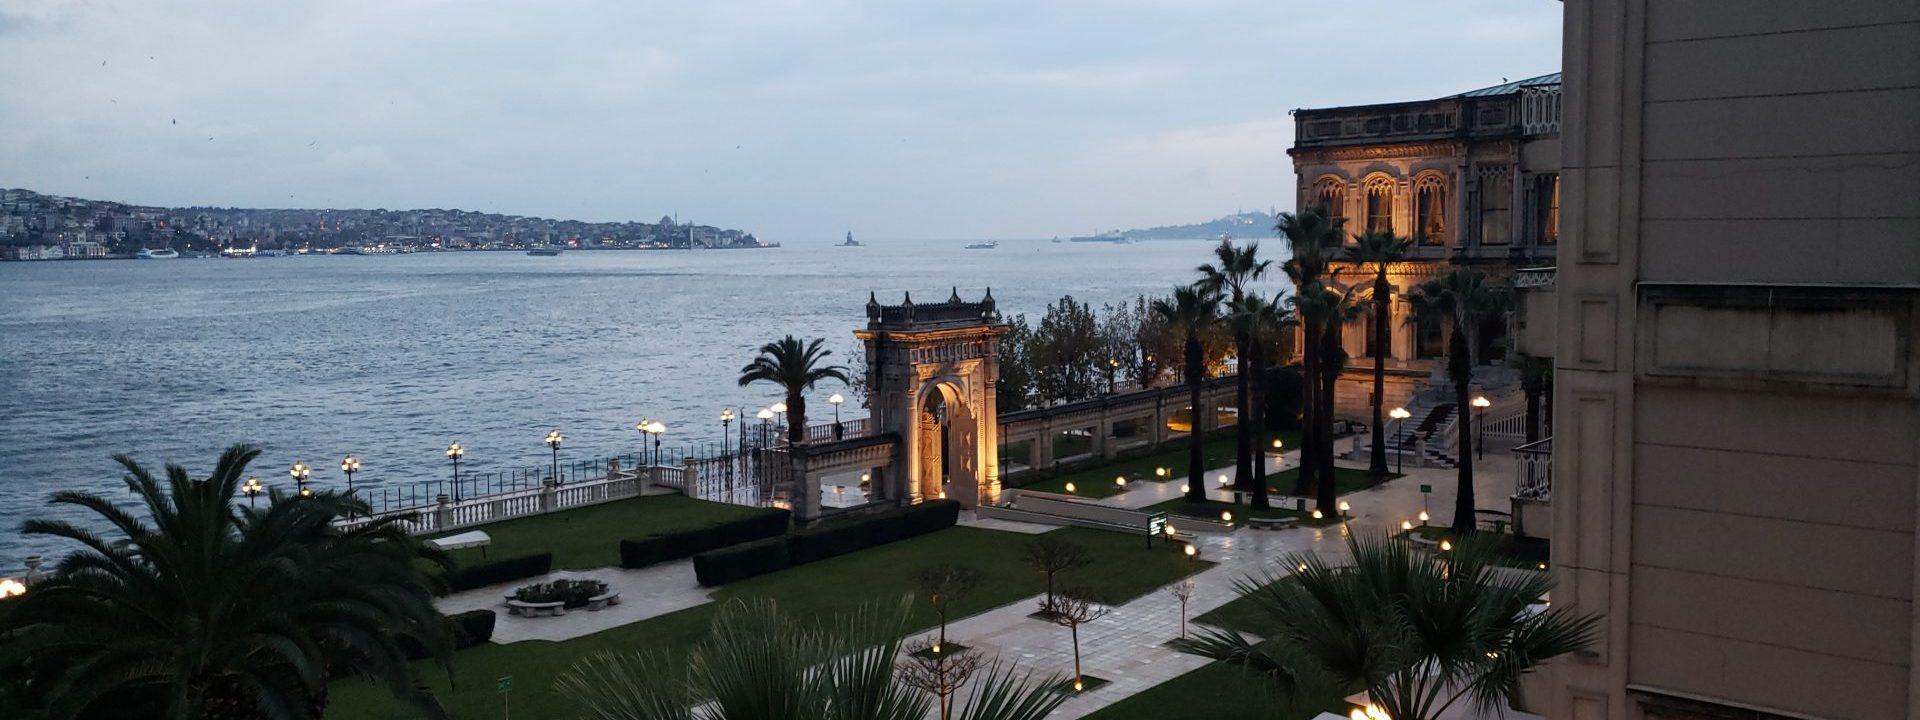 Be treated like royalty at Çırağan Palace Kempinski Istanbul